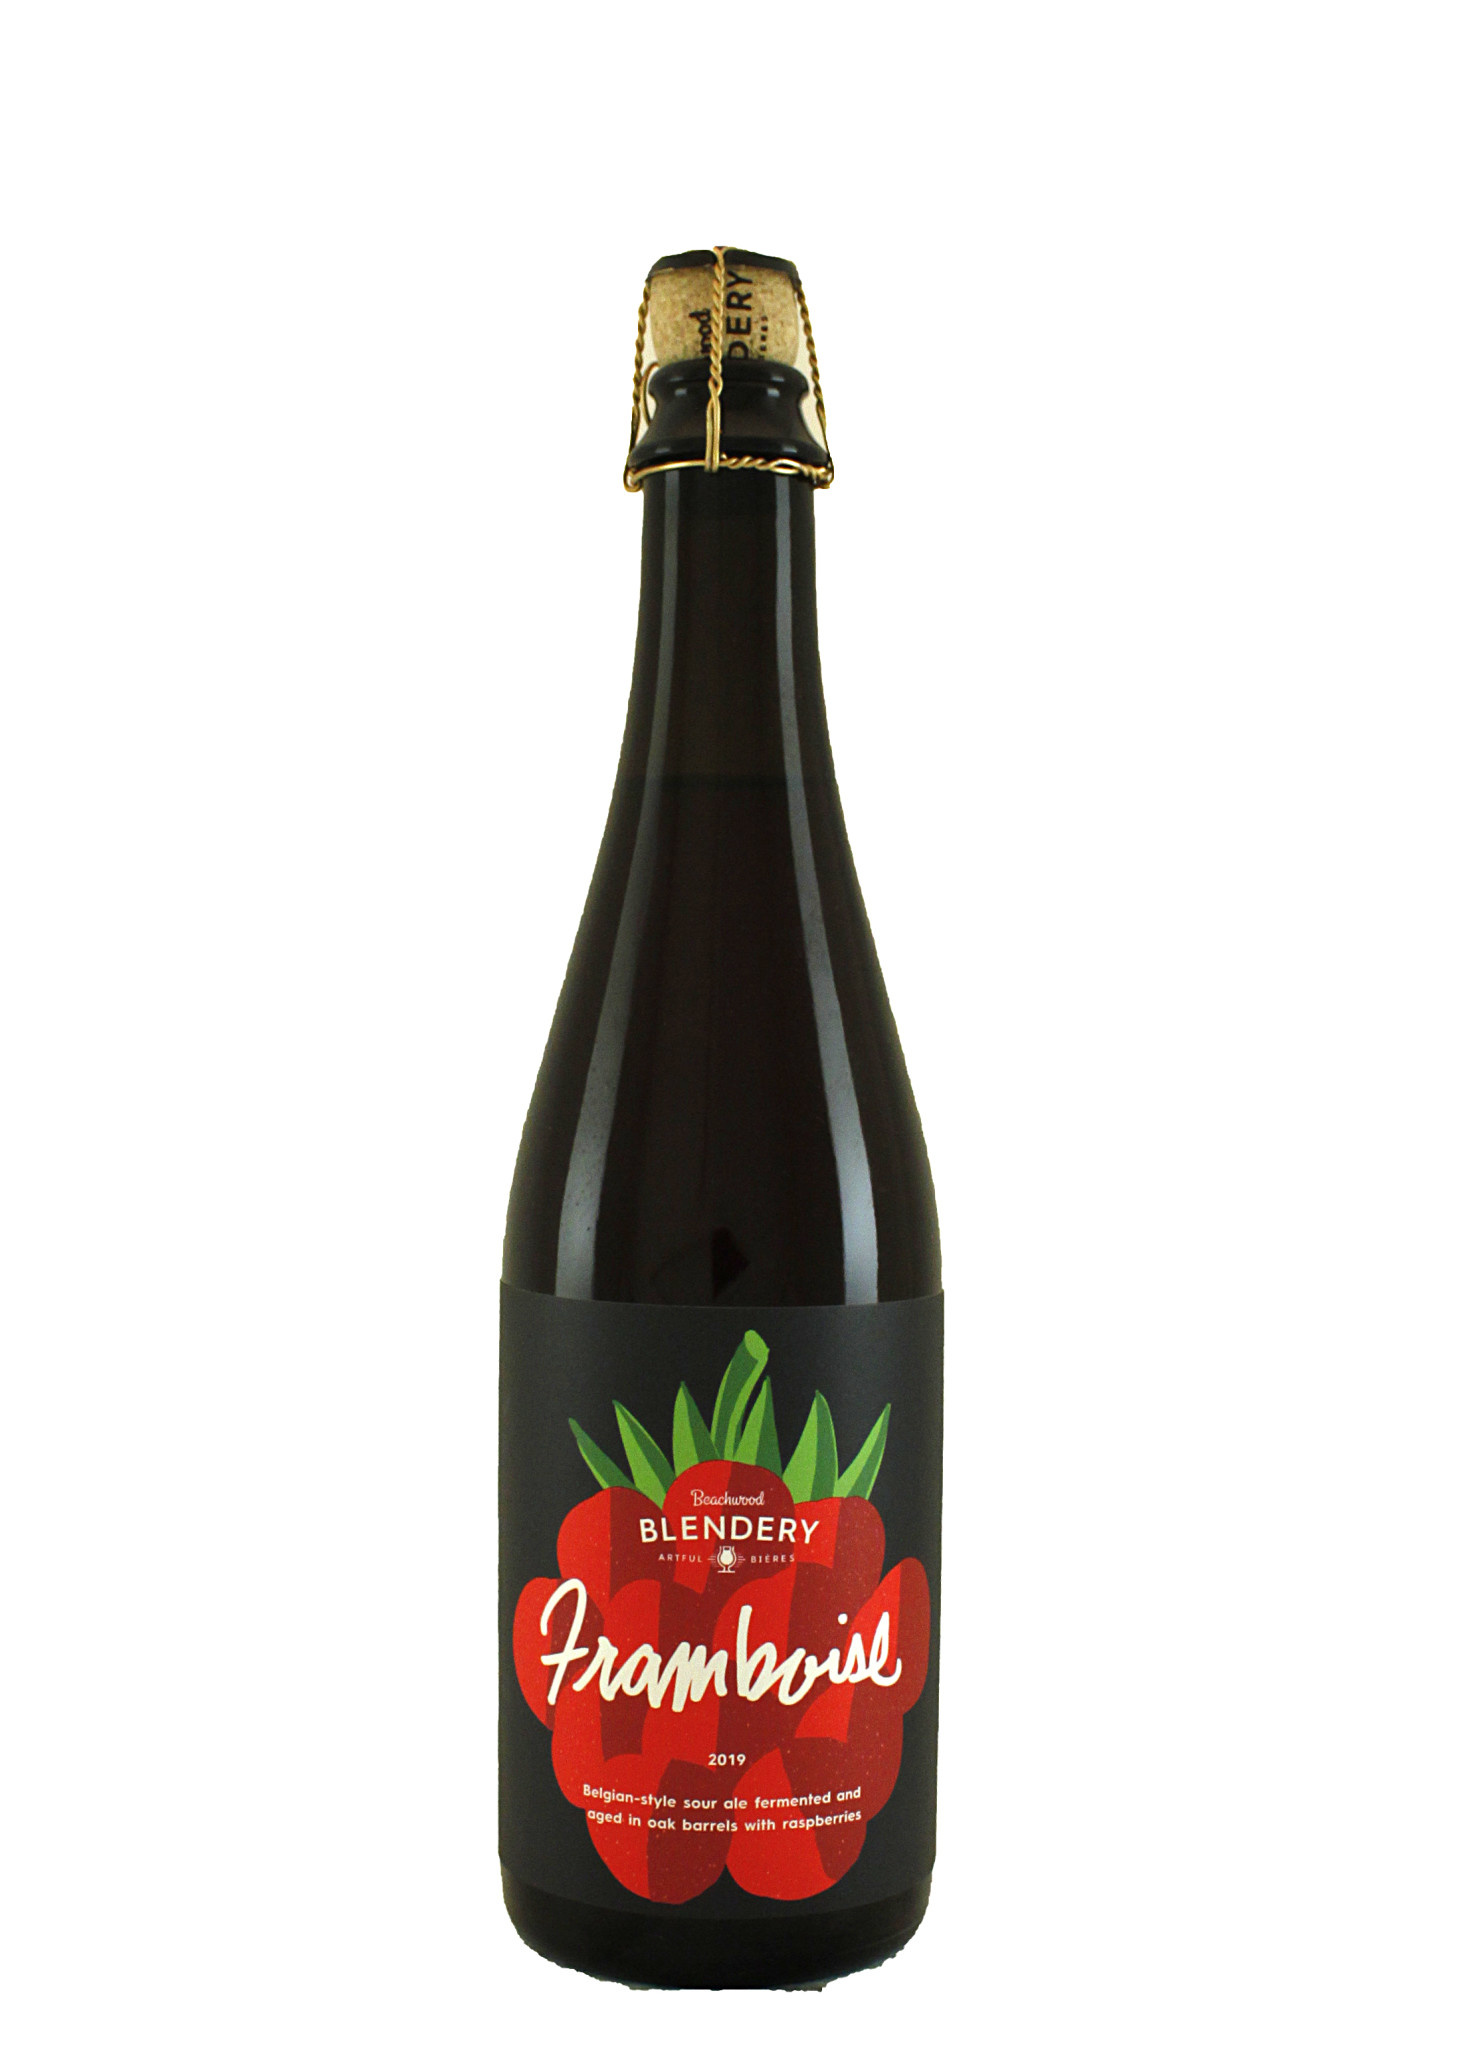 "Beachwood Blendery ""Framboise"" 2019 Belgian-Style Sour Ale 500ml. Bottle - Long Beach, CA"